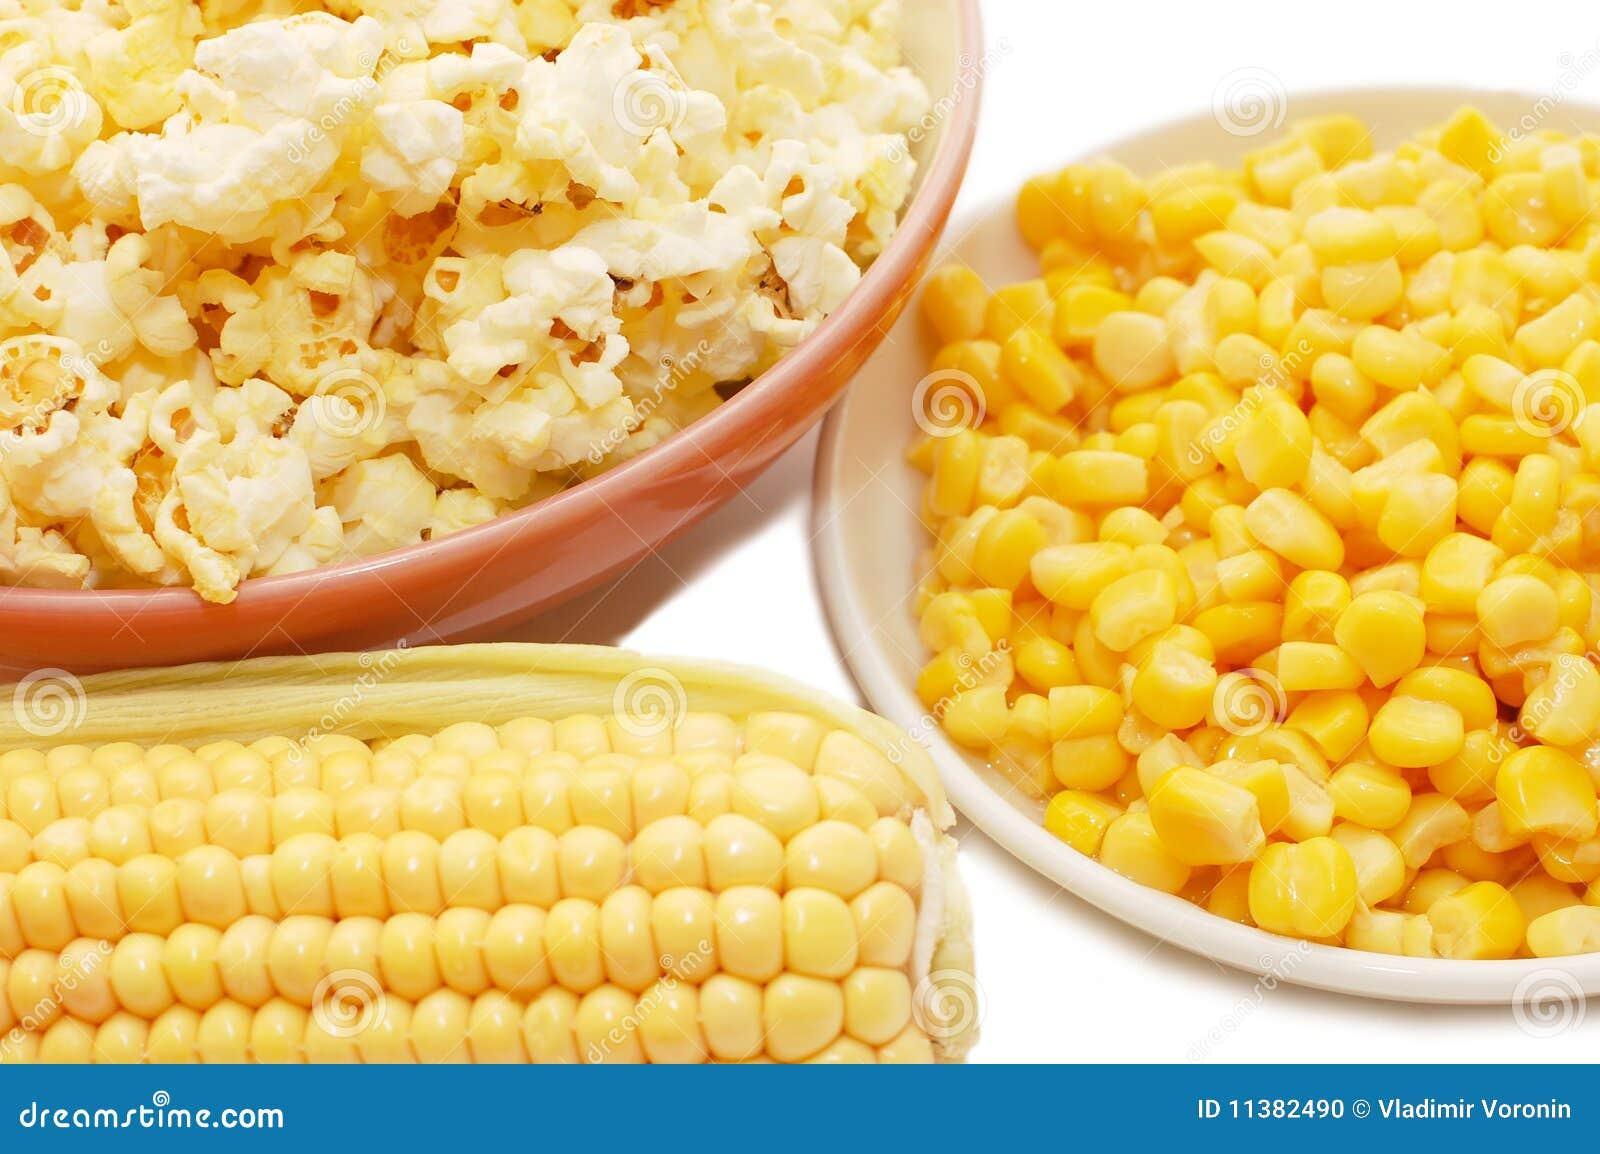 Maíz fresco, maíz preservado y palomitas